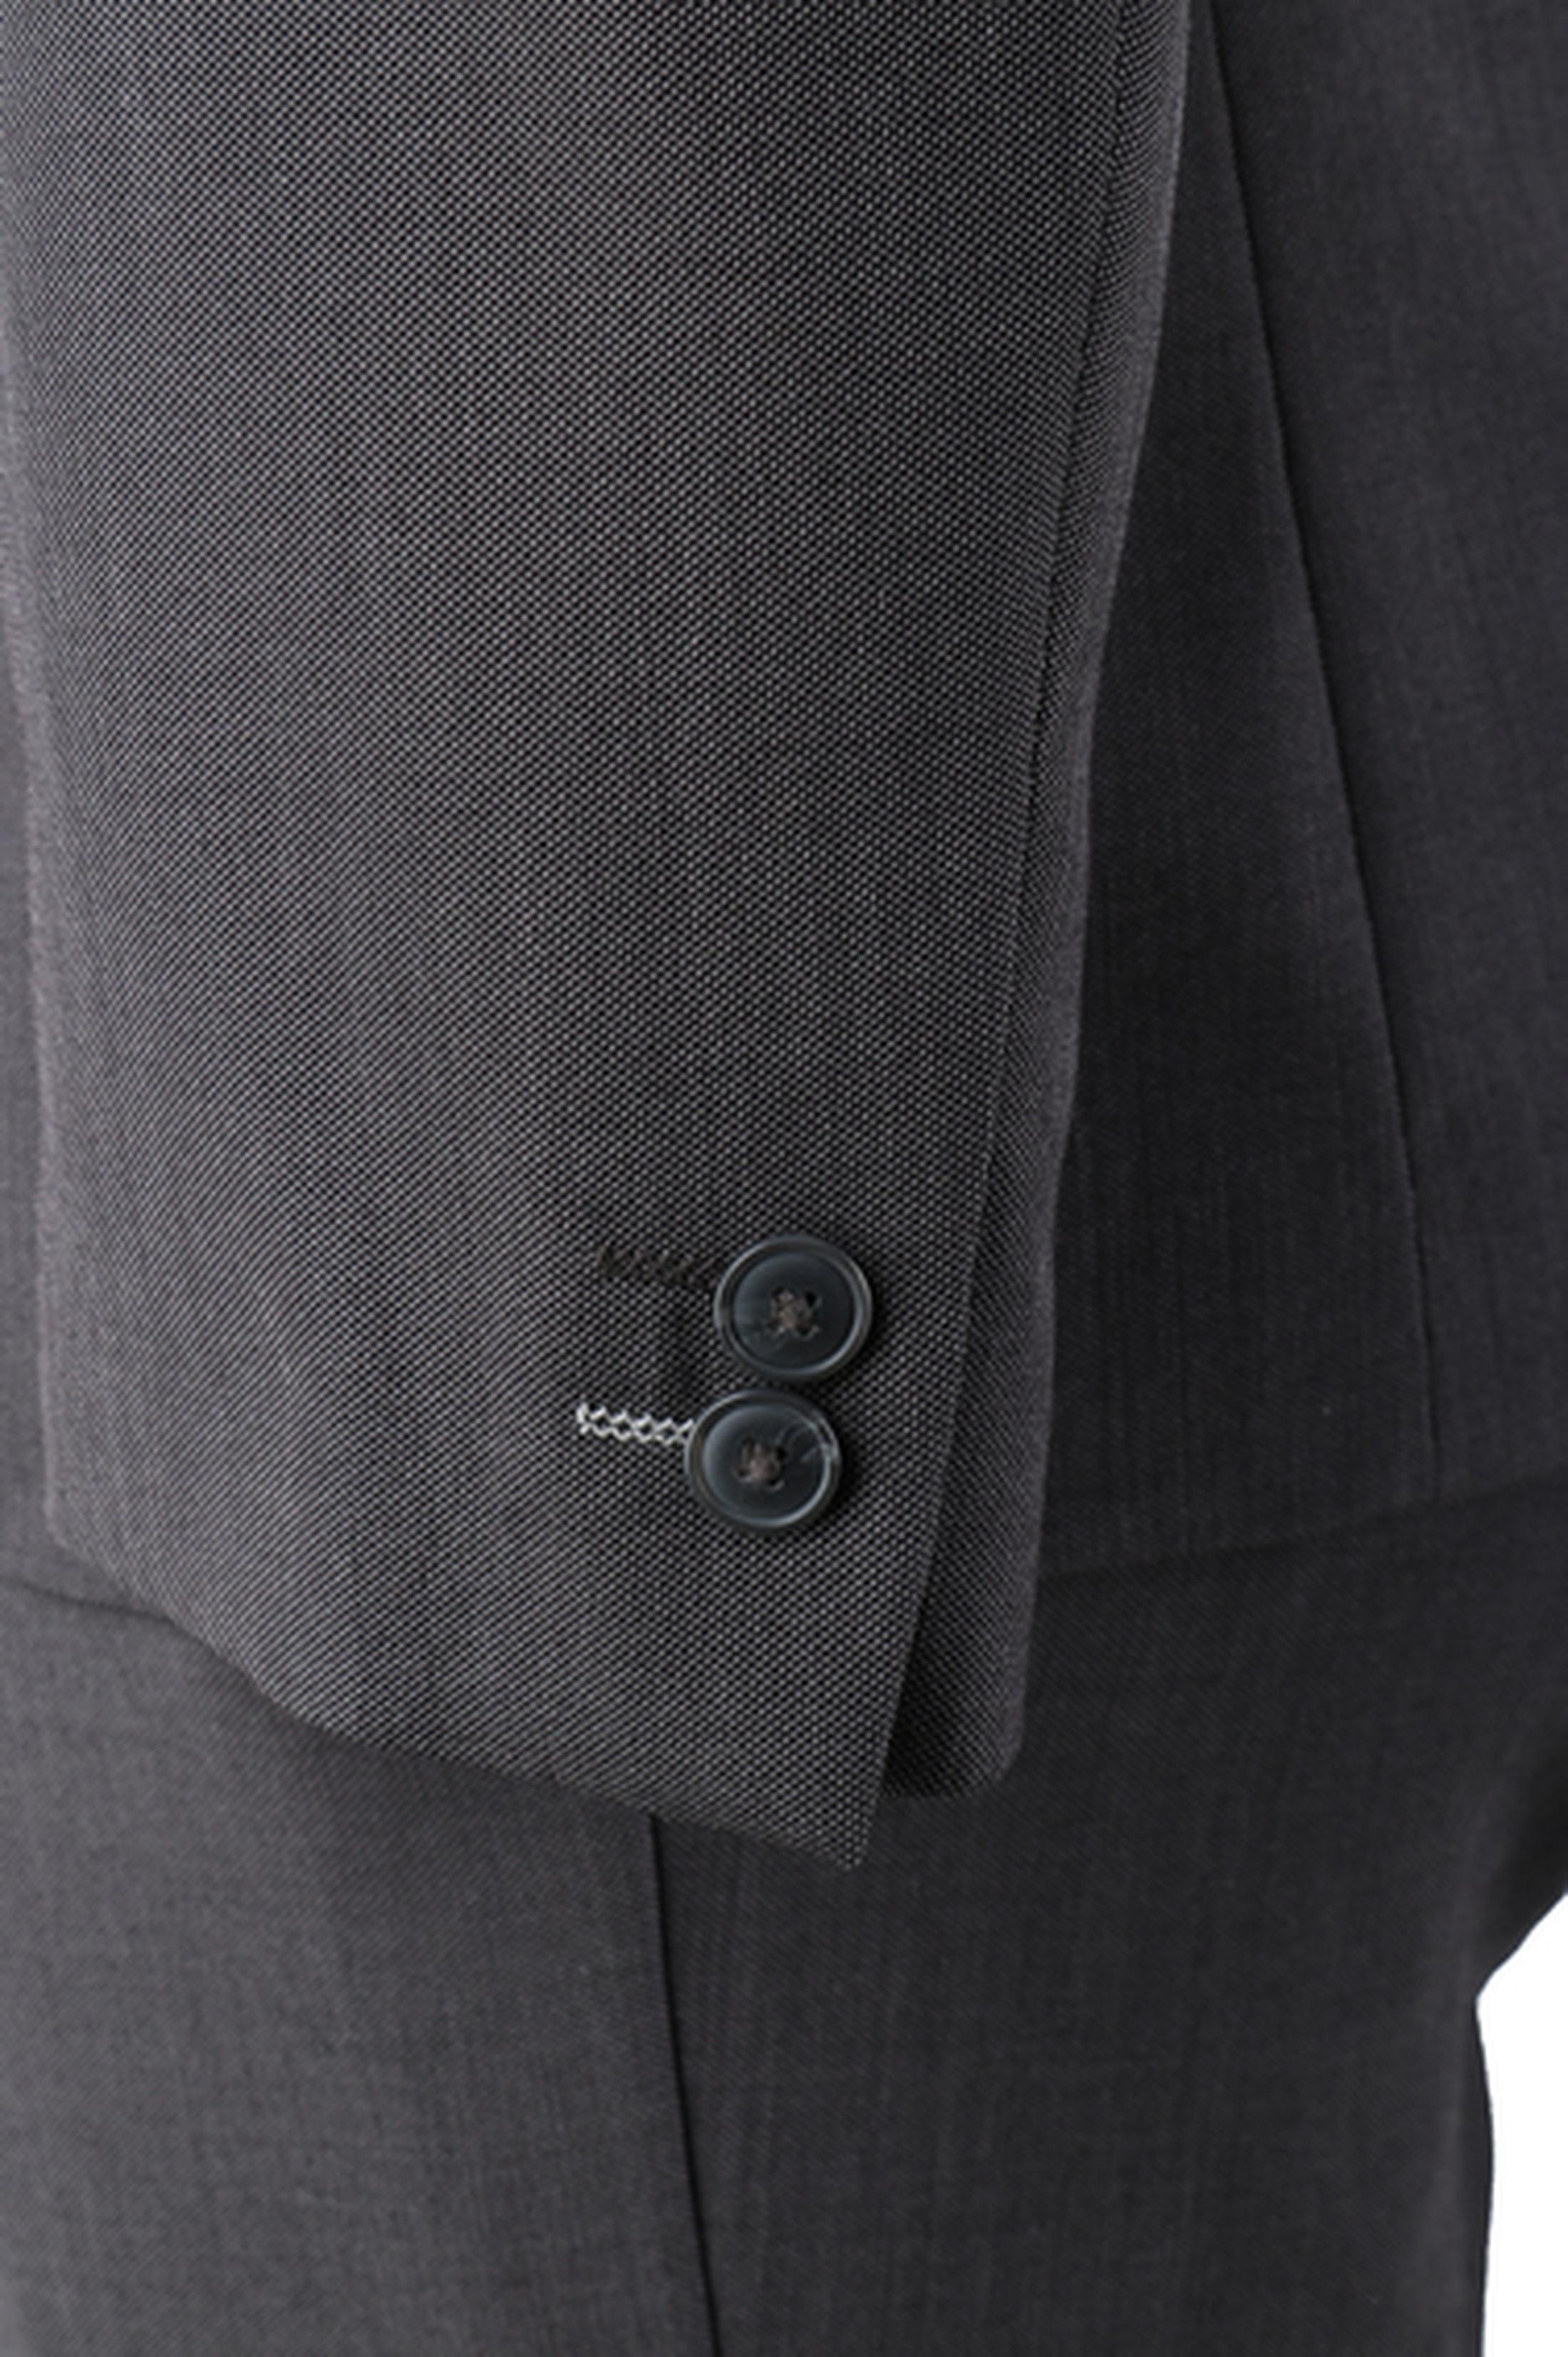 Sneaker Suit Converses Antraciet foto 2